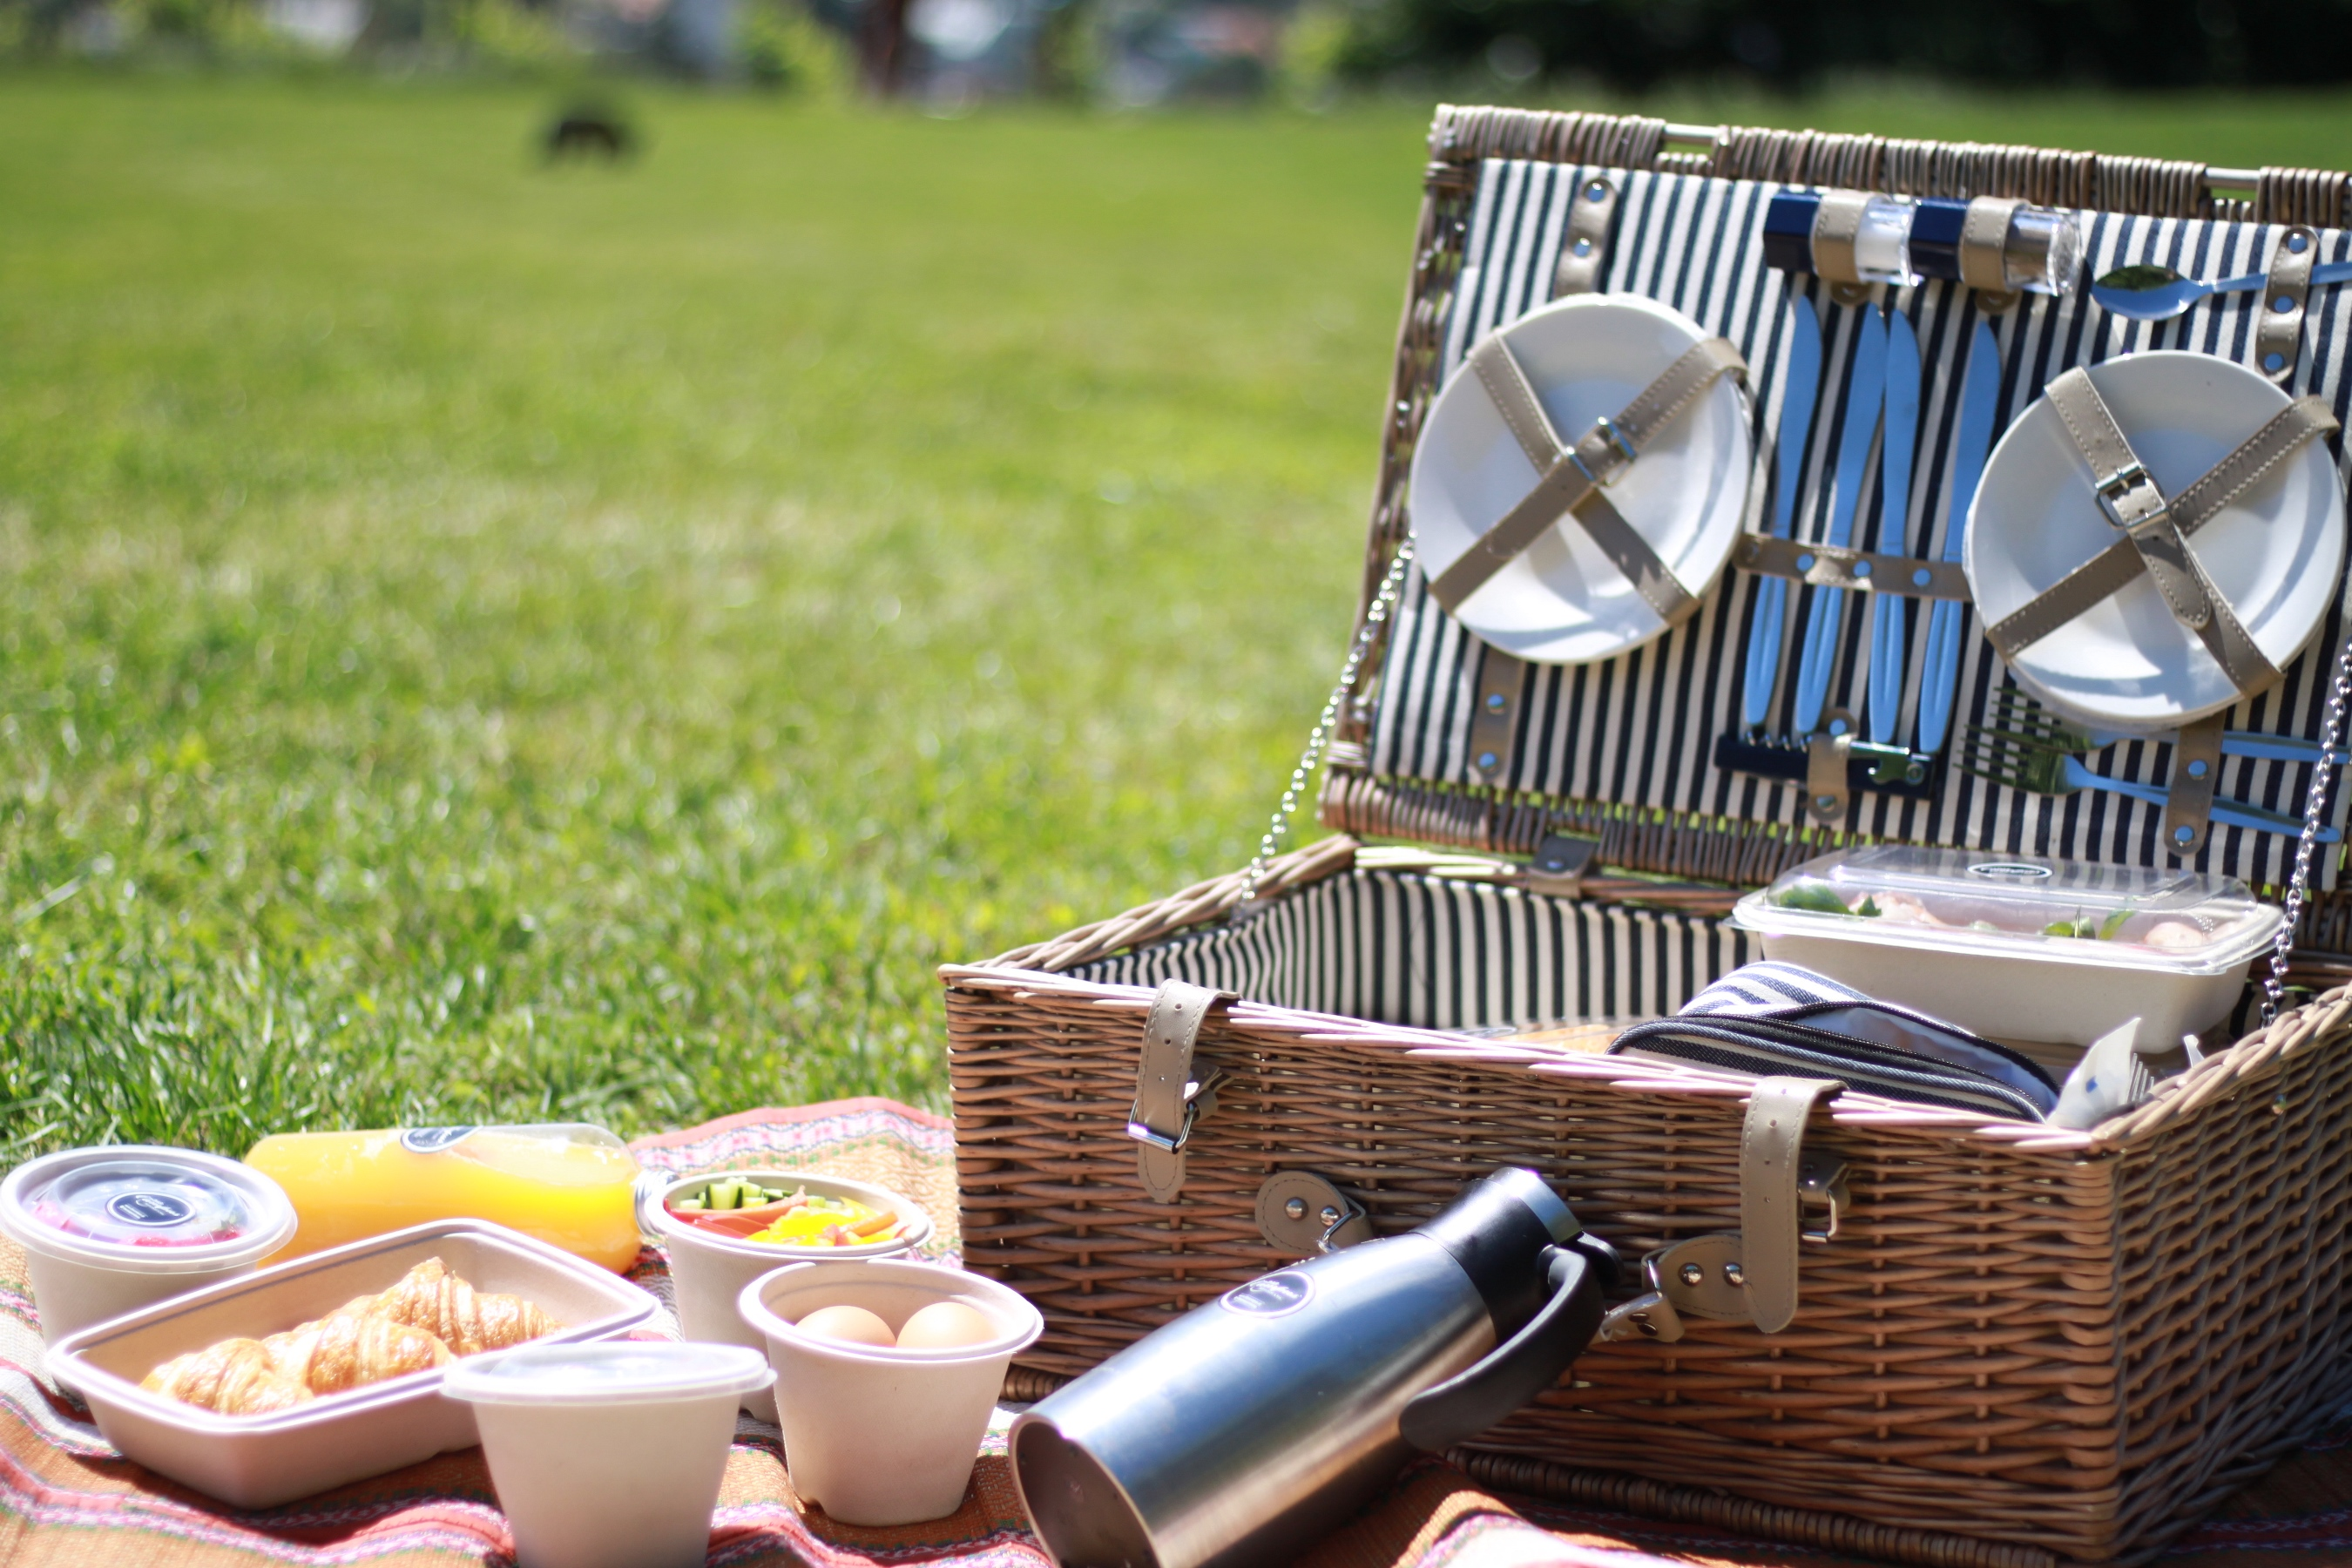 Breakfast in the park Goodmorning Vienna (14)